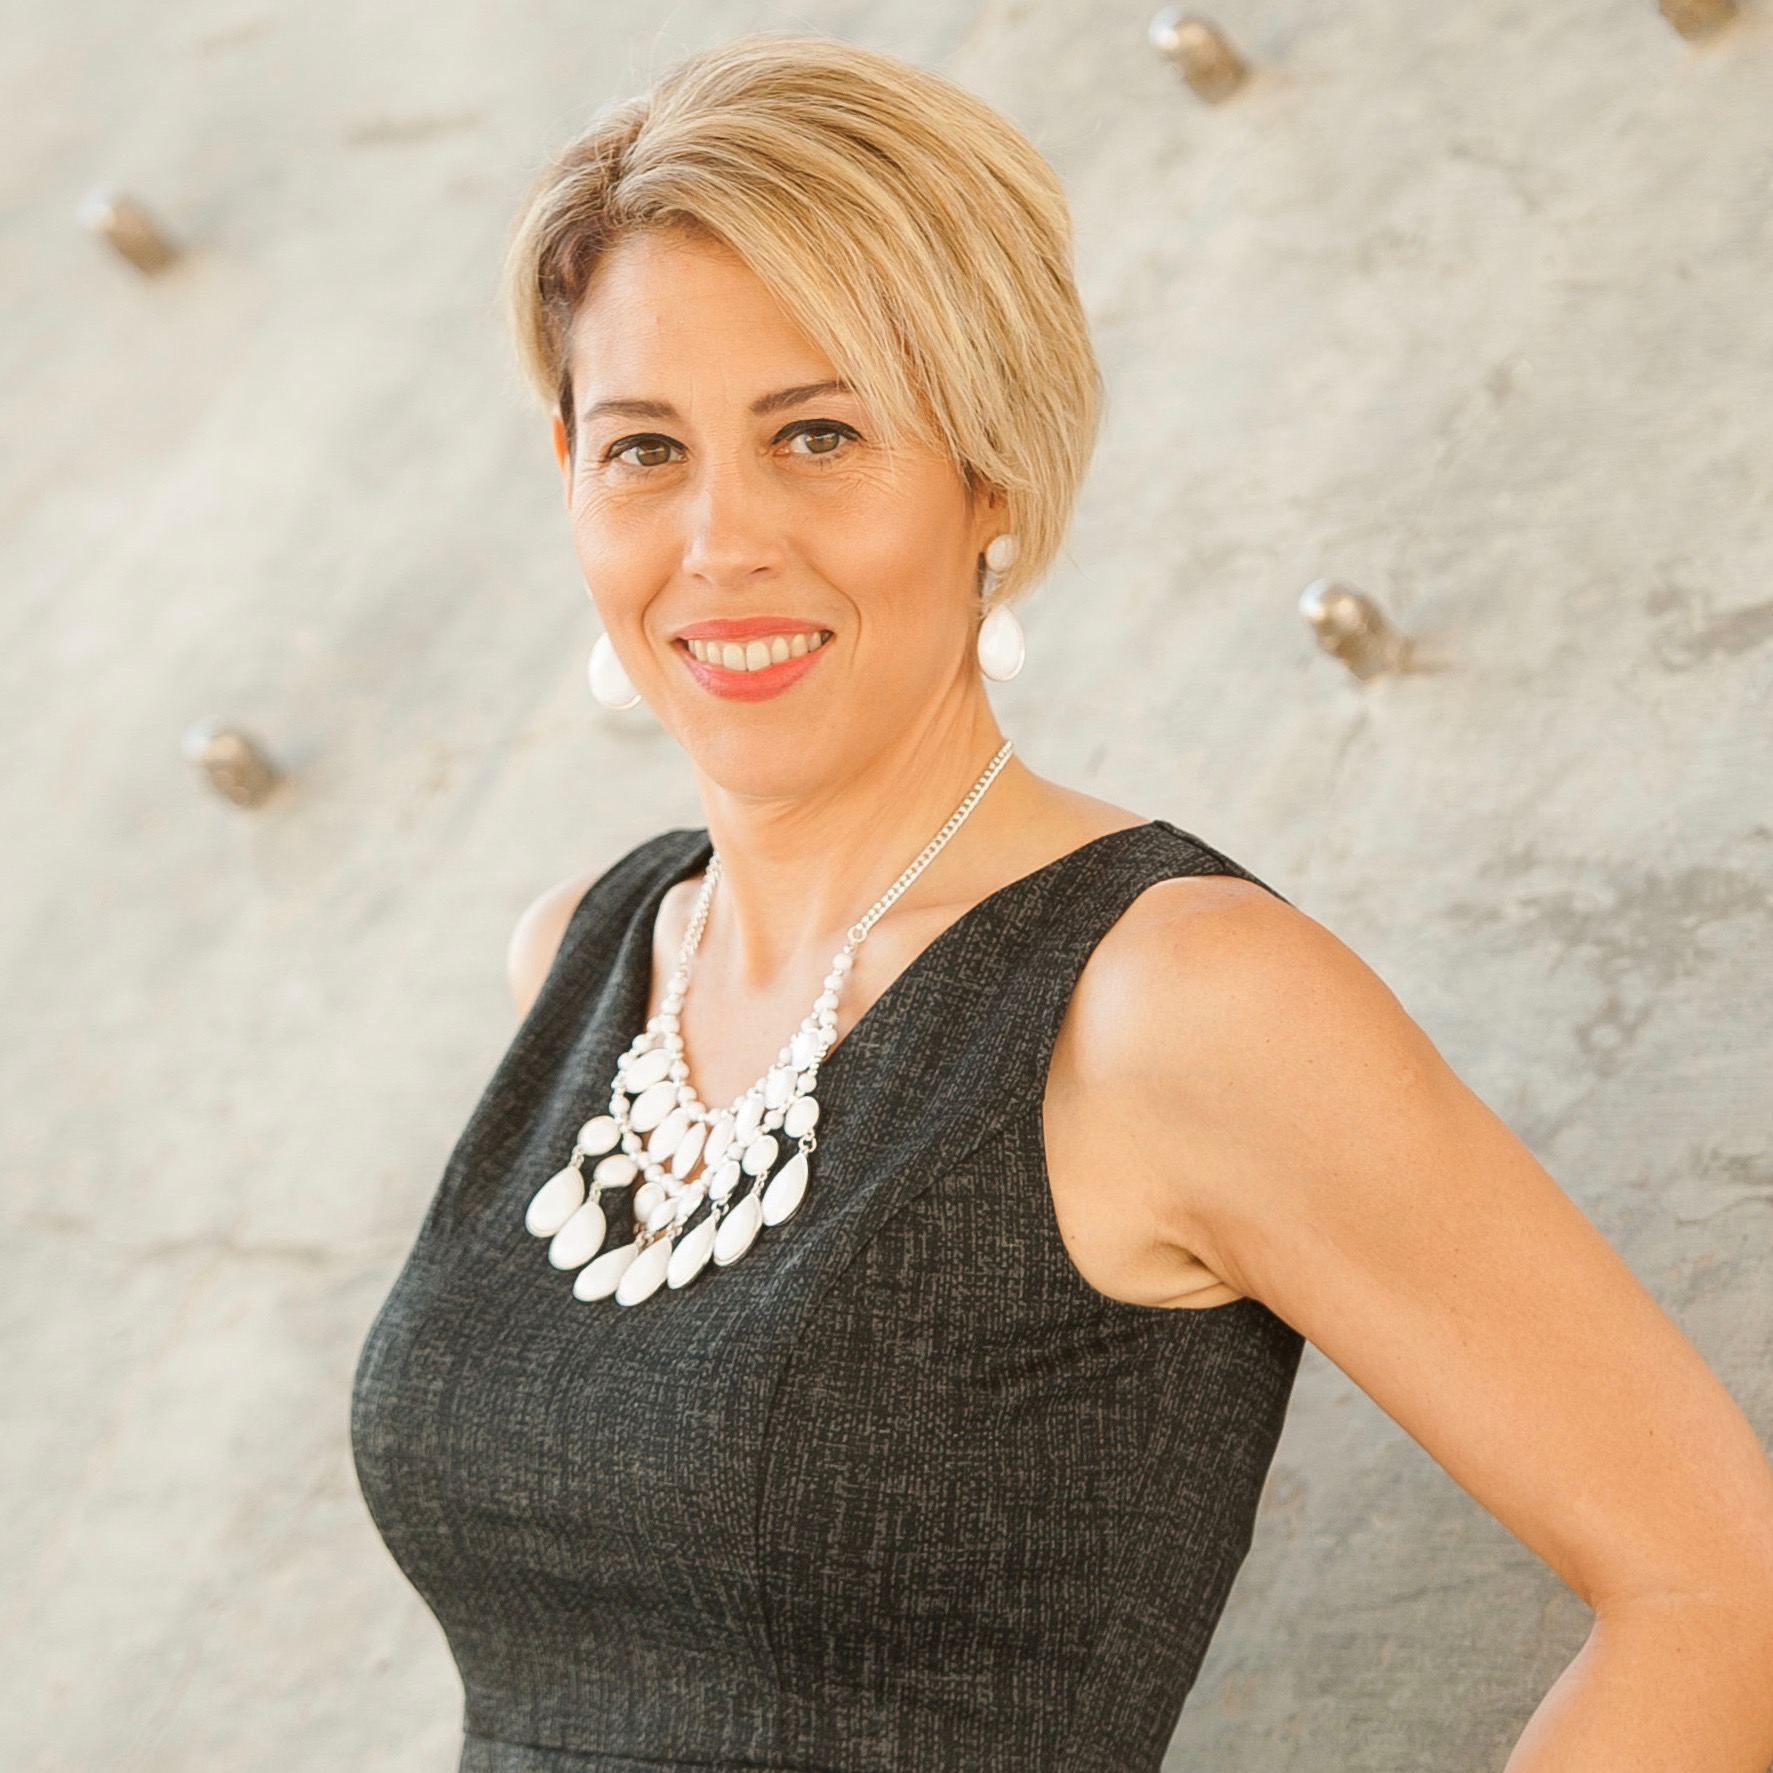 Dr. Laura Baltodano